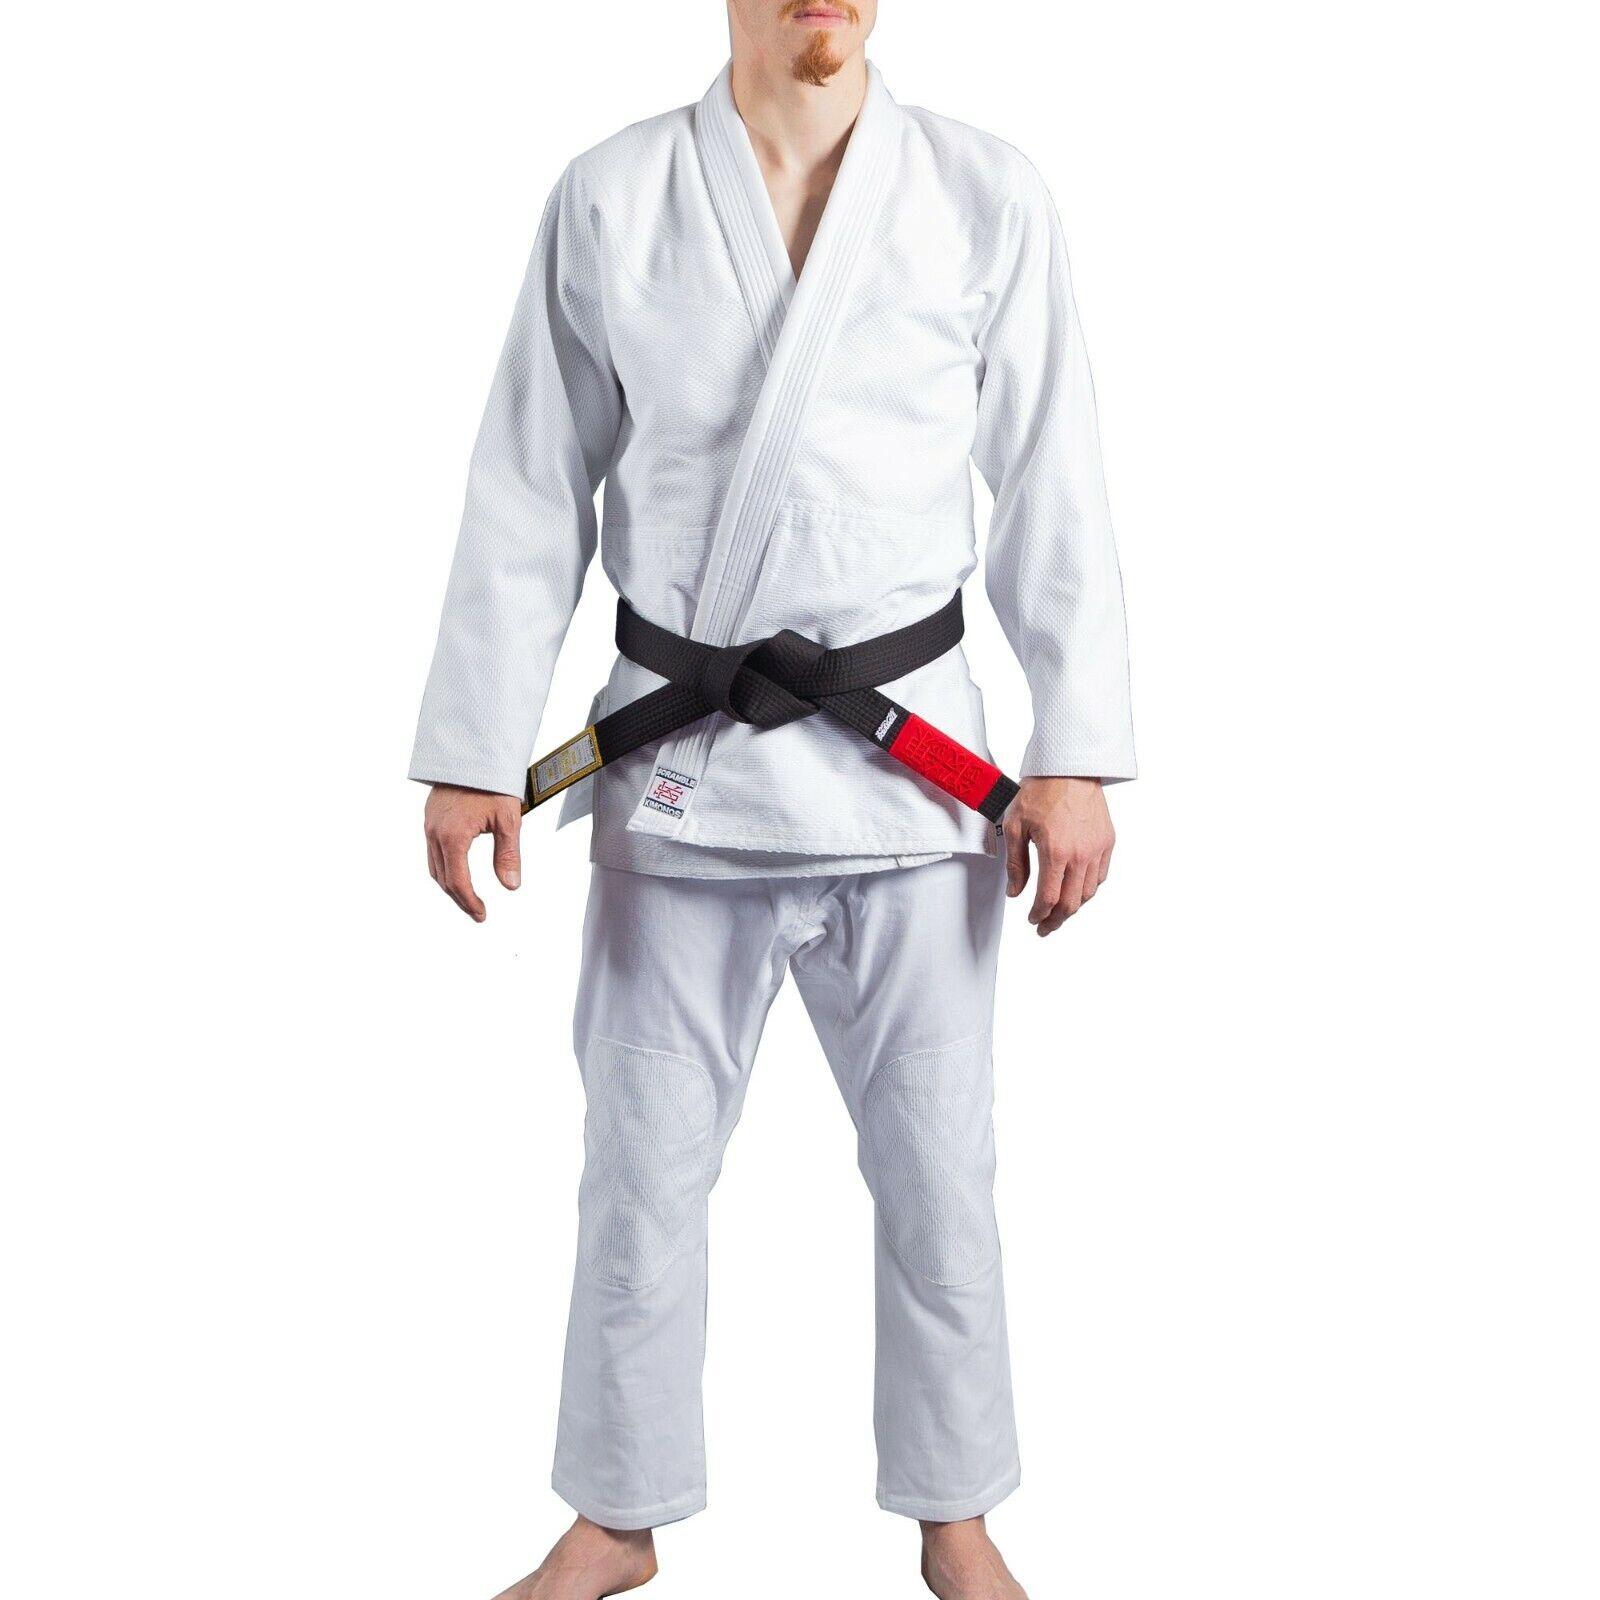 Scramble Athlete 2 White BJJ Gi Brazilian Jiu-Jitsu Gi Kimono Uniform